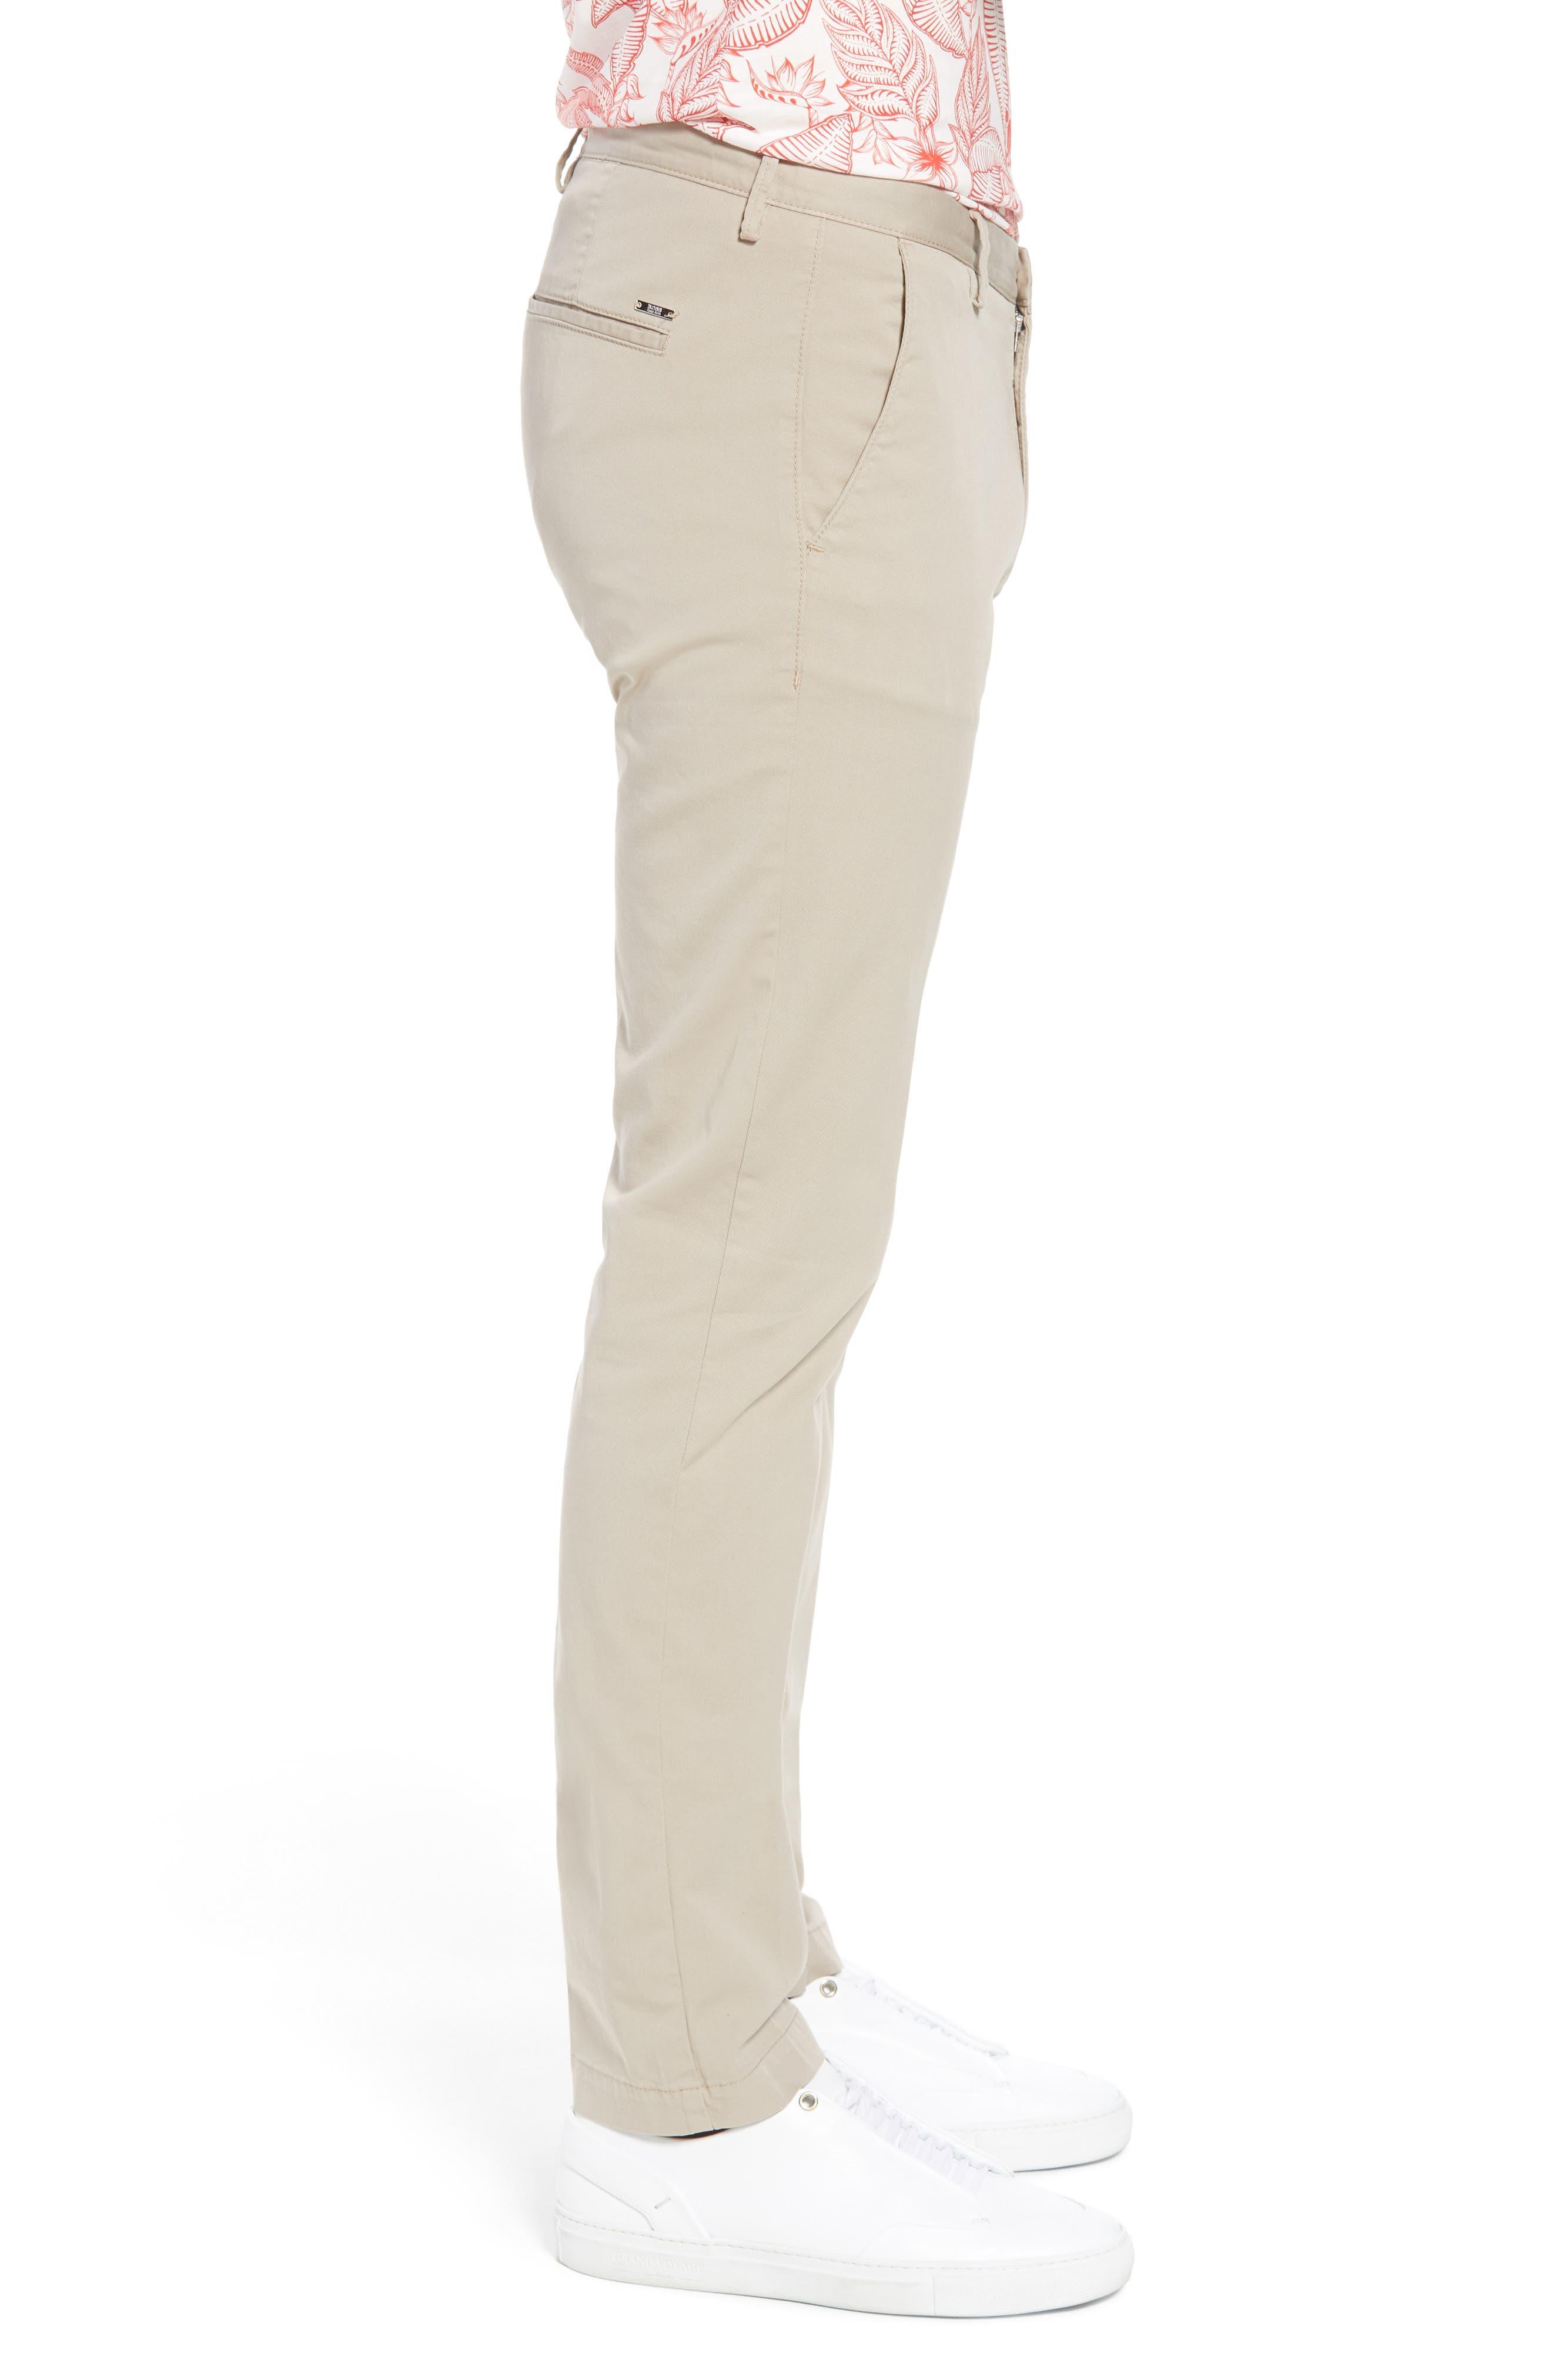 Rice Slim Fit Chino Pants,                             Alternate thumbnail 3, color,                             Brown